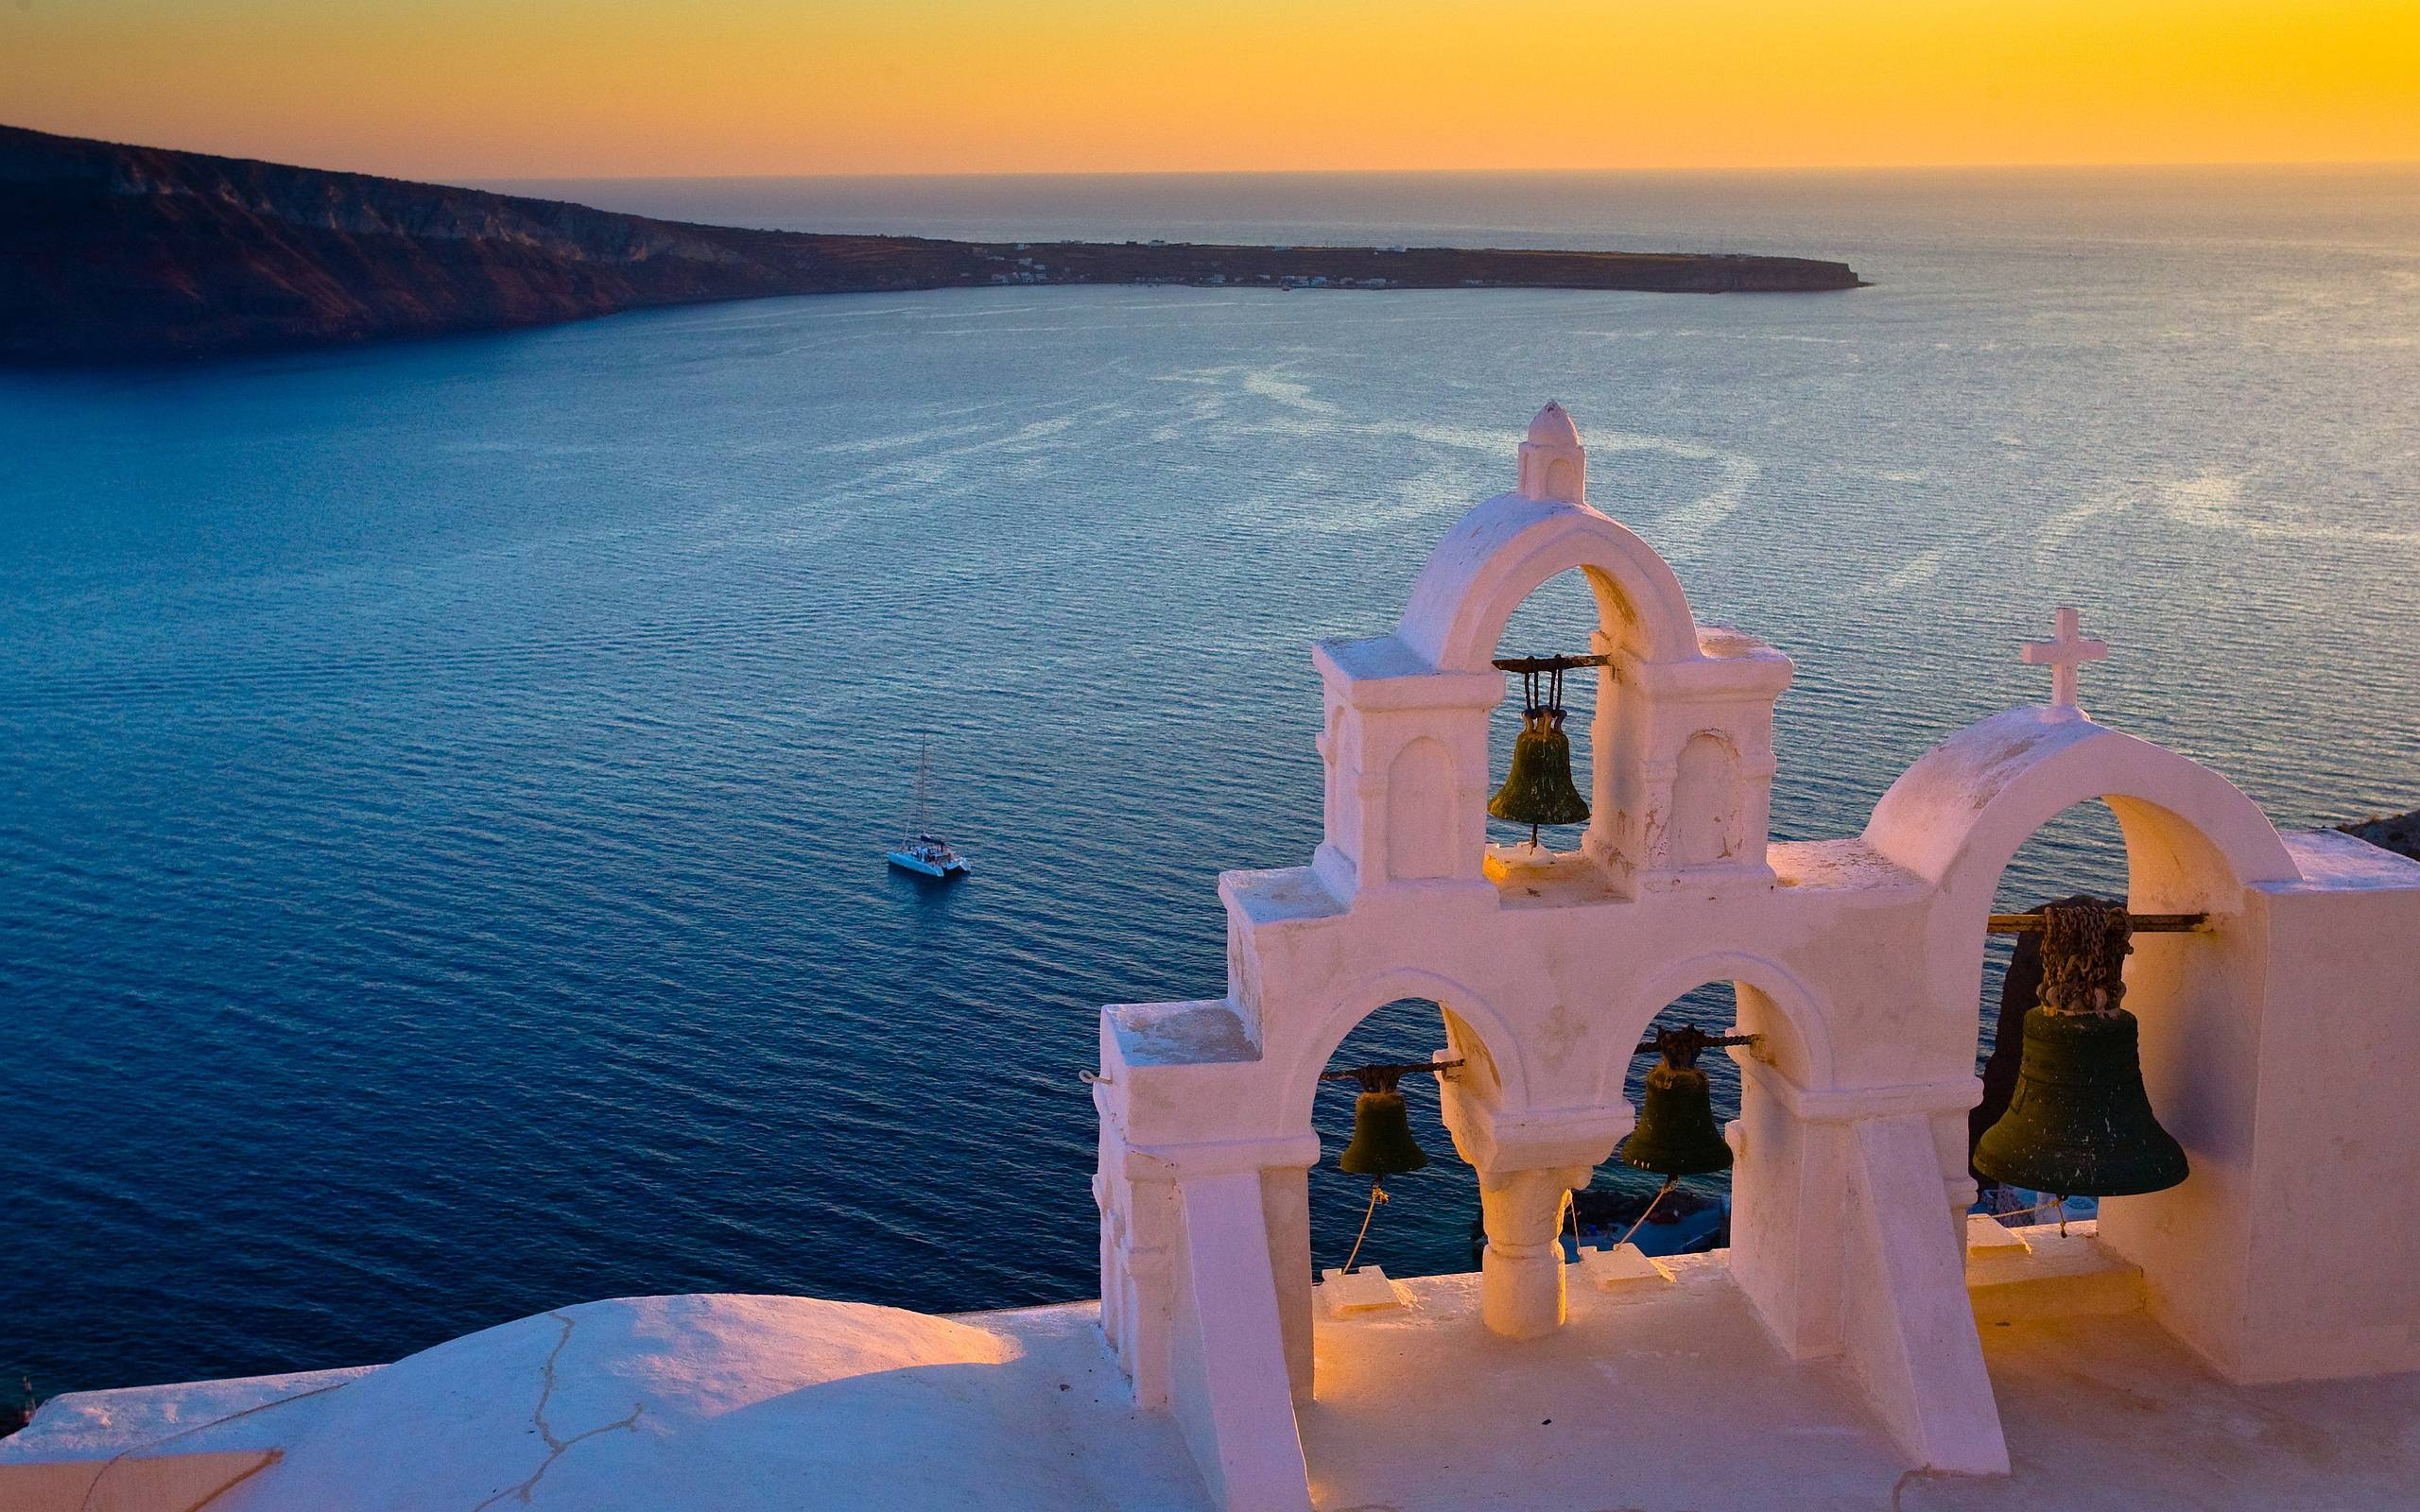 oia greece santorini wallpaper - photo #36